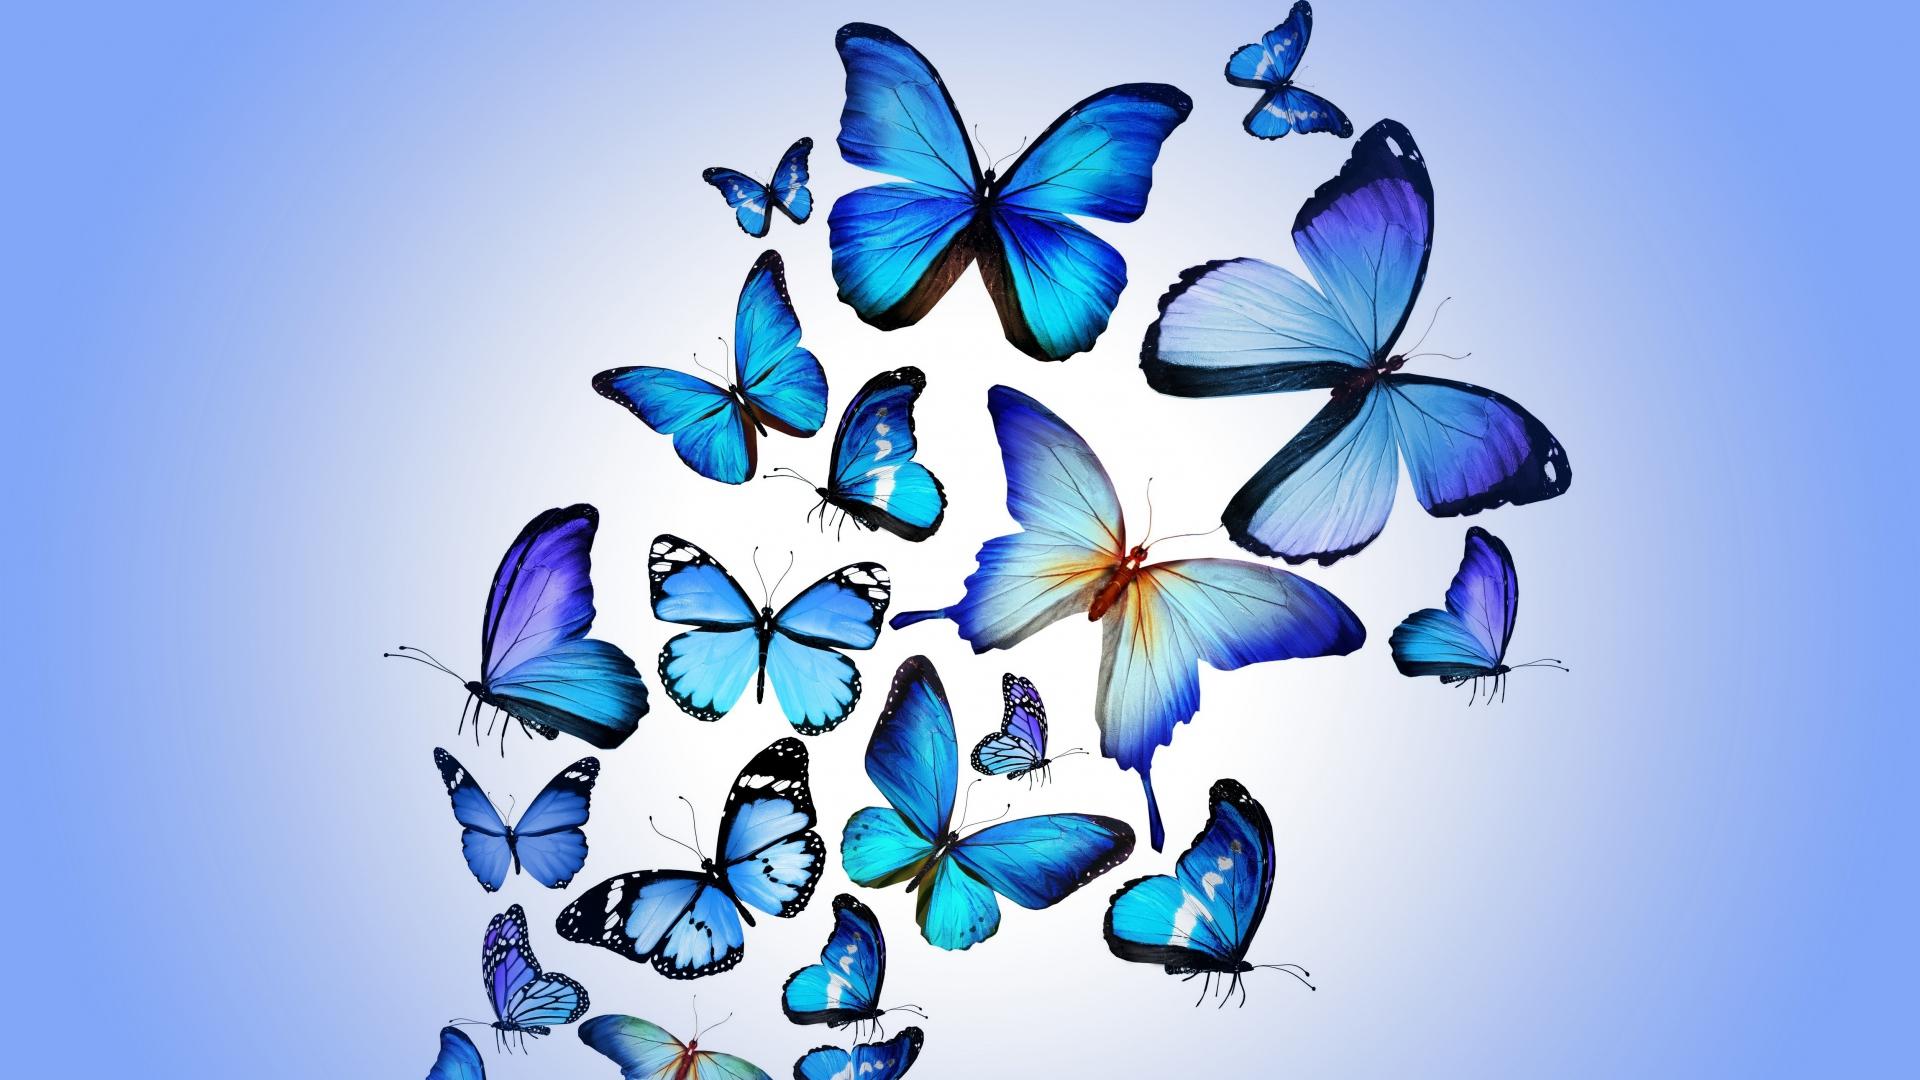 Blue butterfly wallpaper HD Desktop Wallpaper 1920x1080